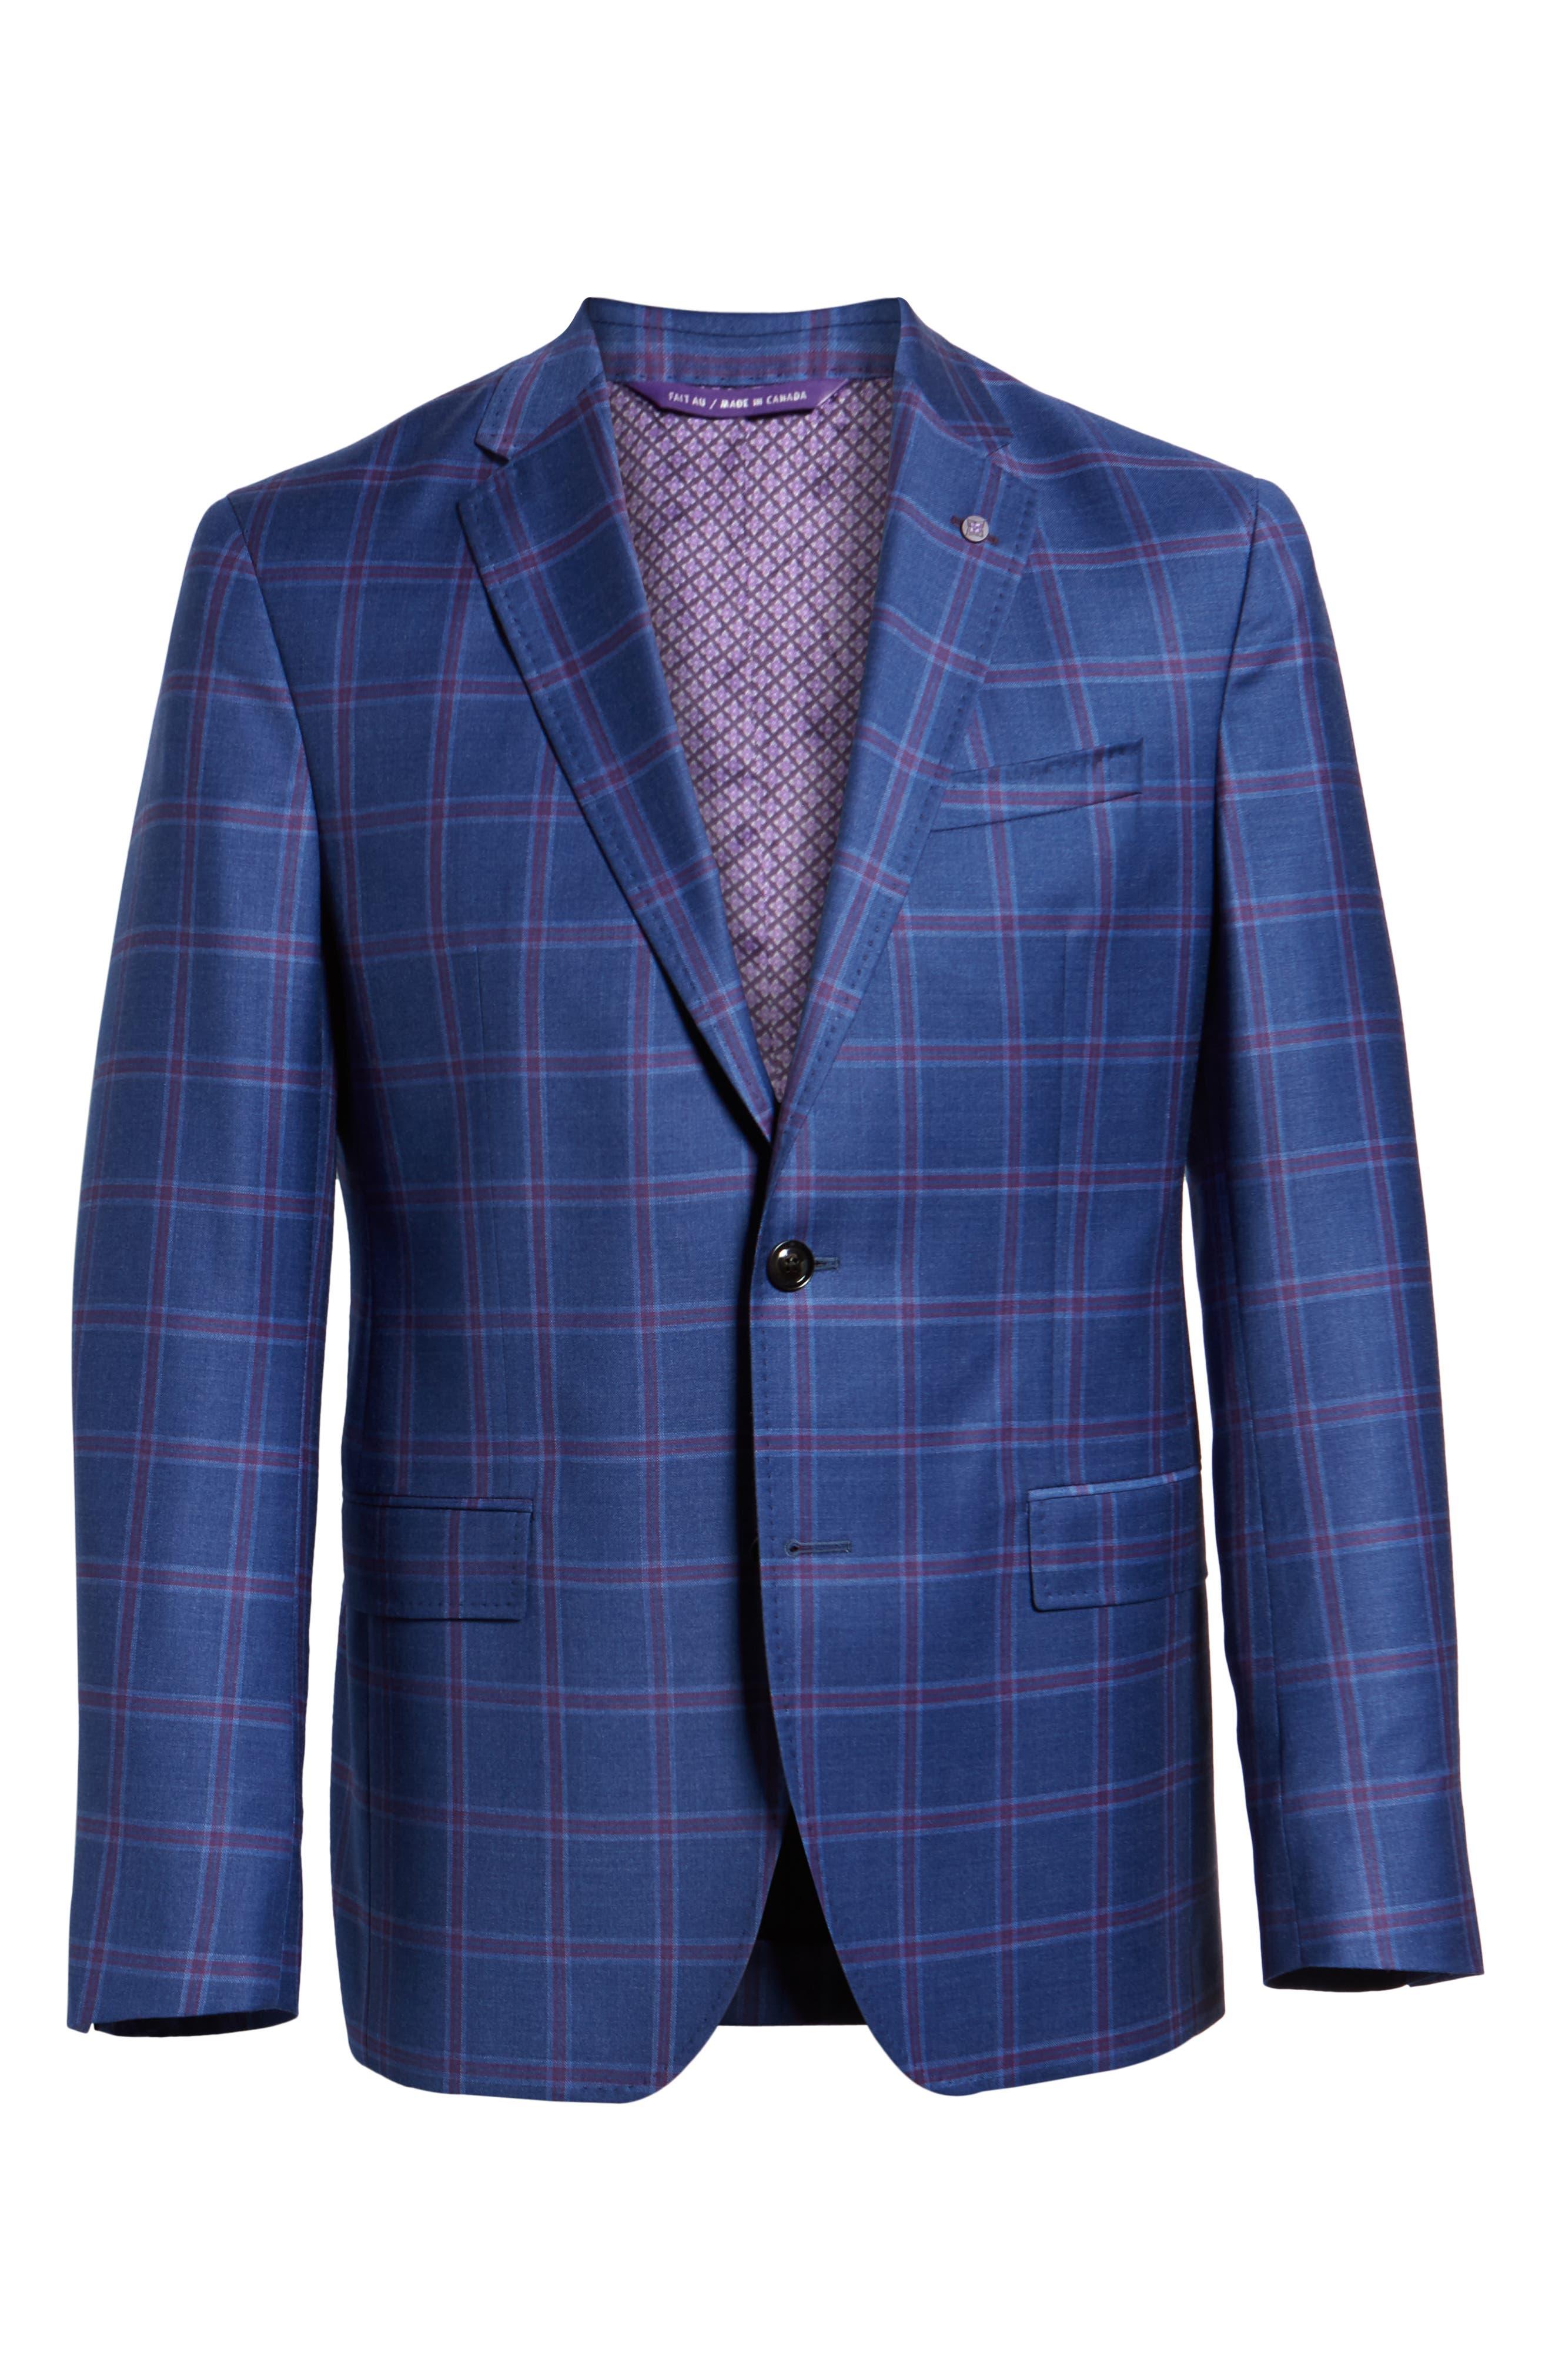 TED BAKER LONDON, Konan Trim Fit Wool Sport Coat, Alternate thumbnail 5, color, BLUE